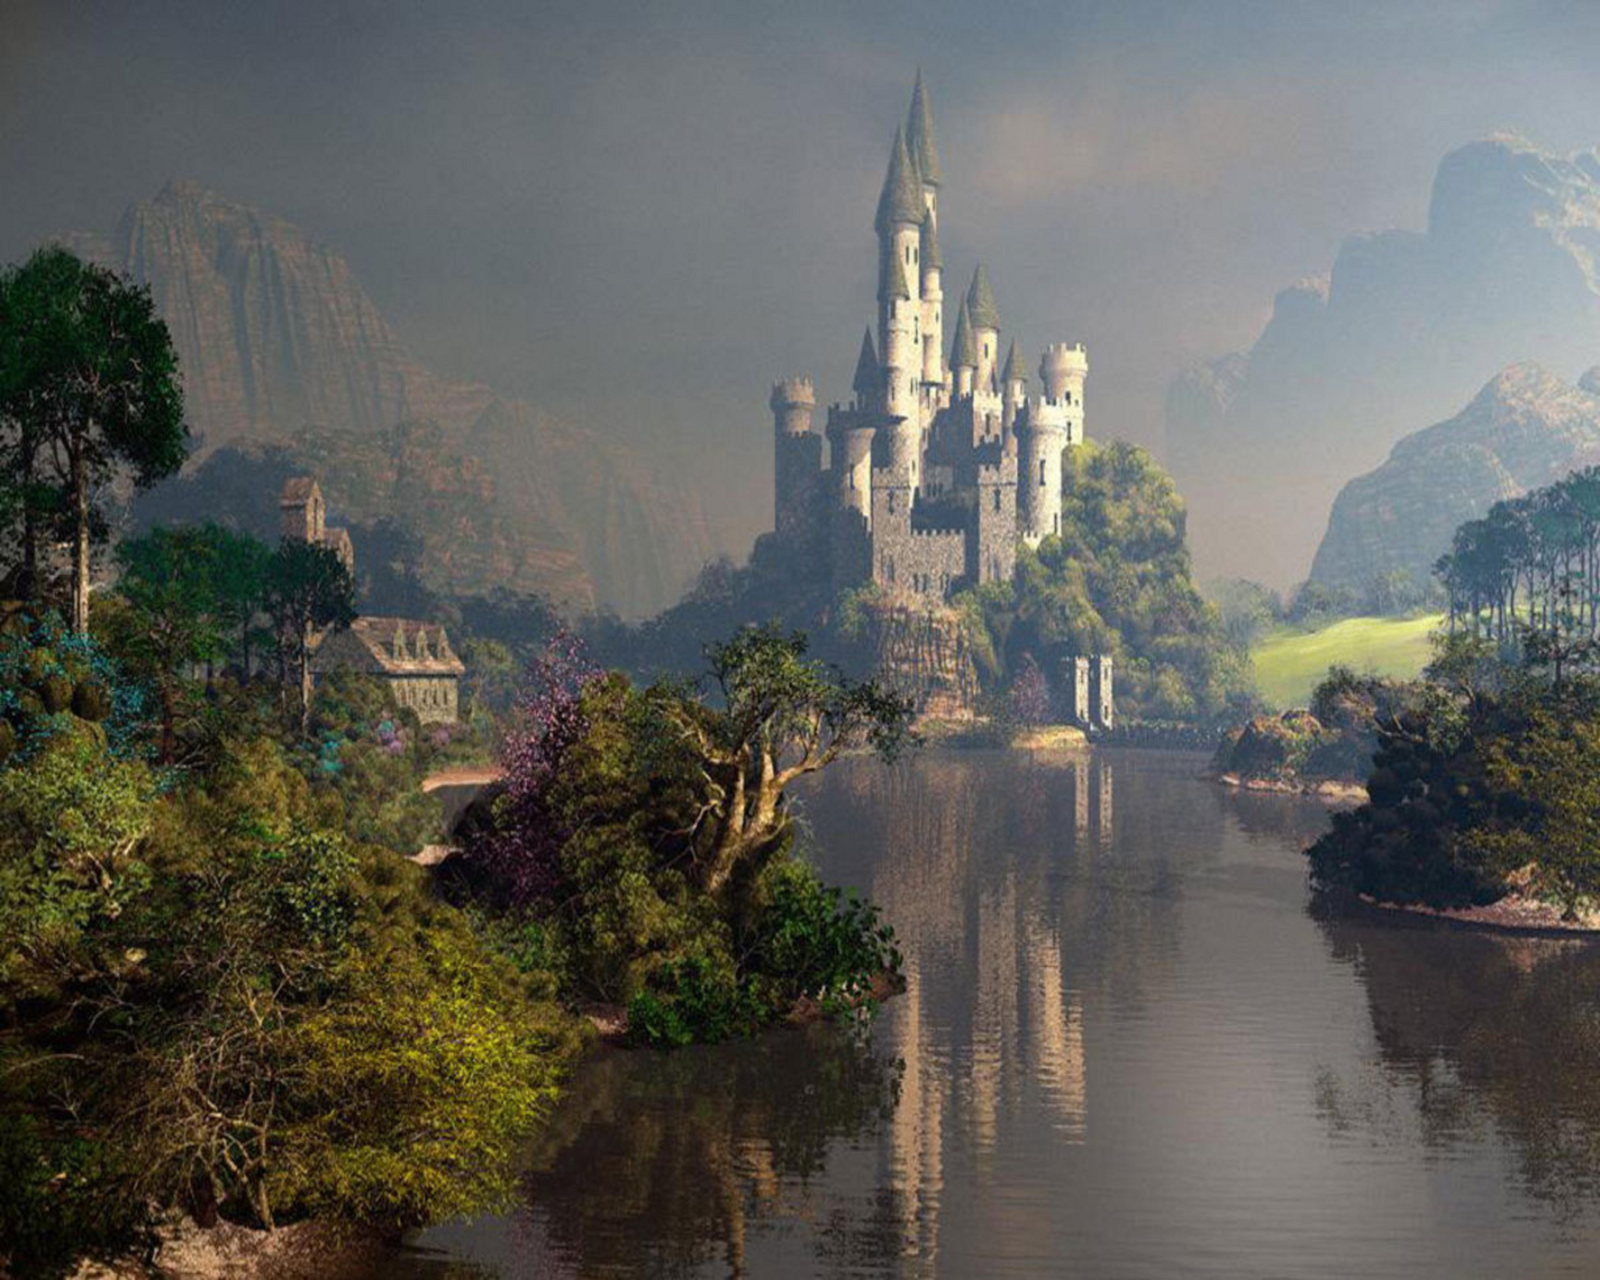 fantasy_castle_by_myjavier007-d6r1jmx.png